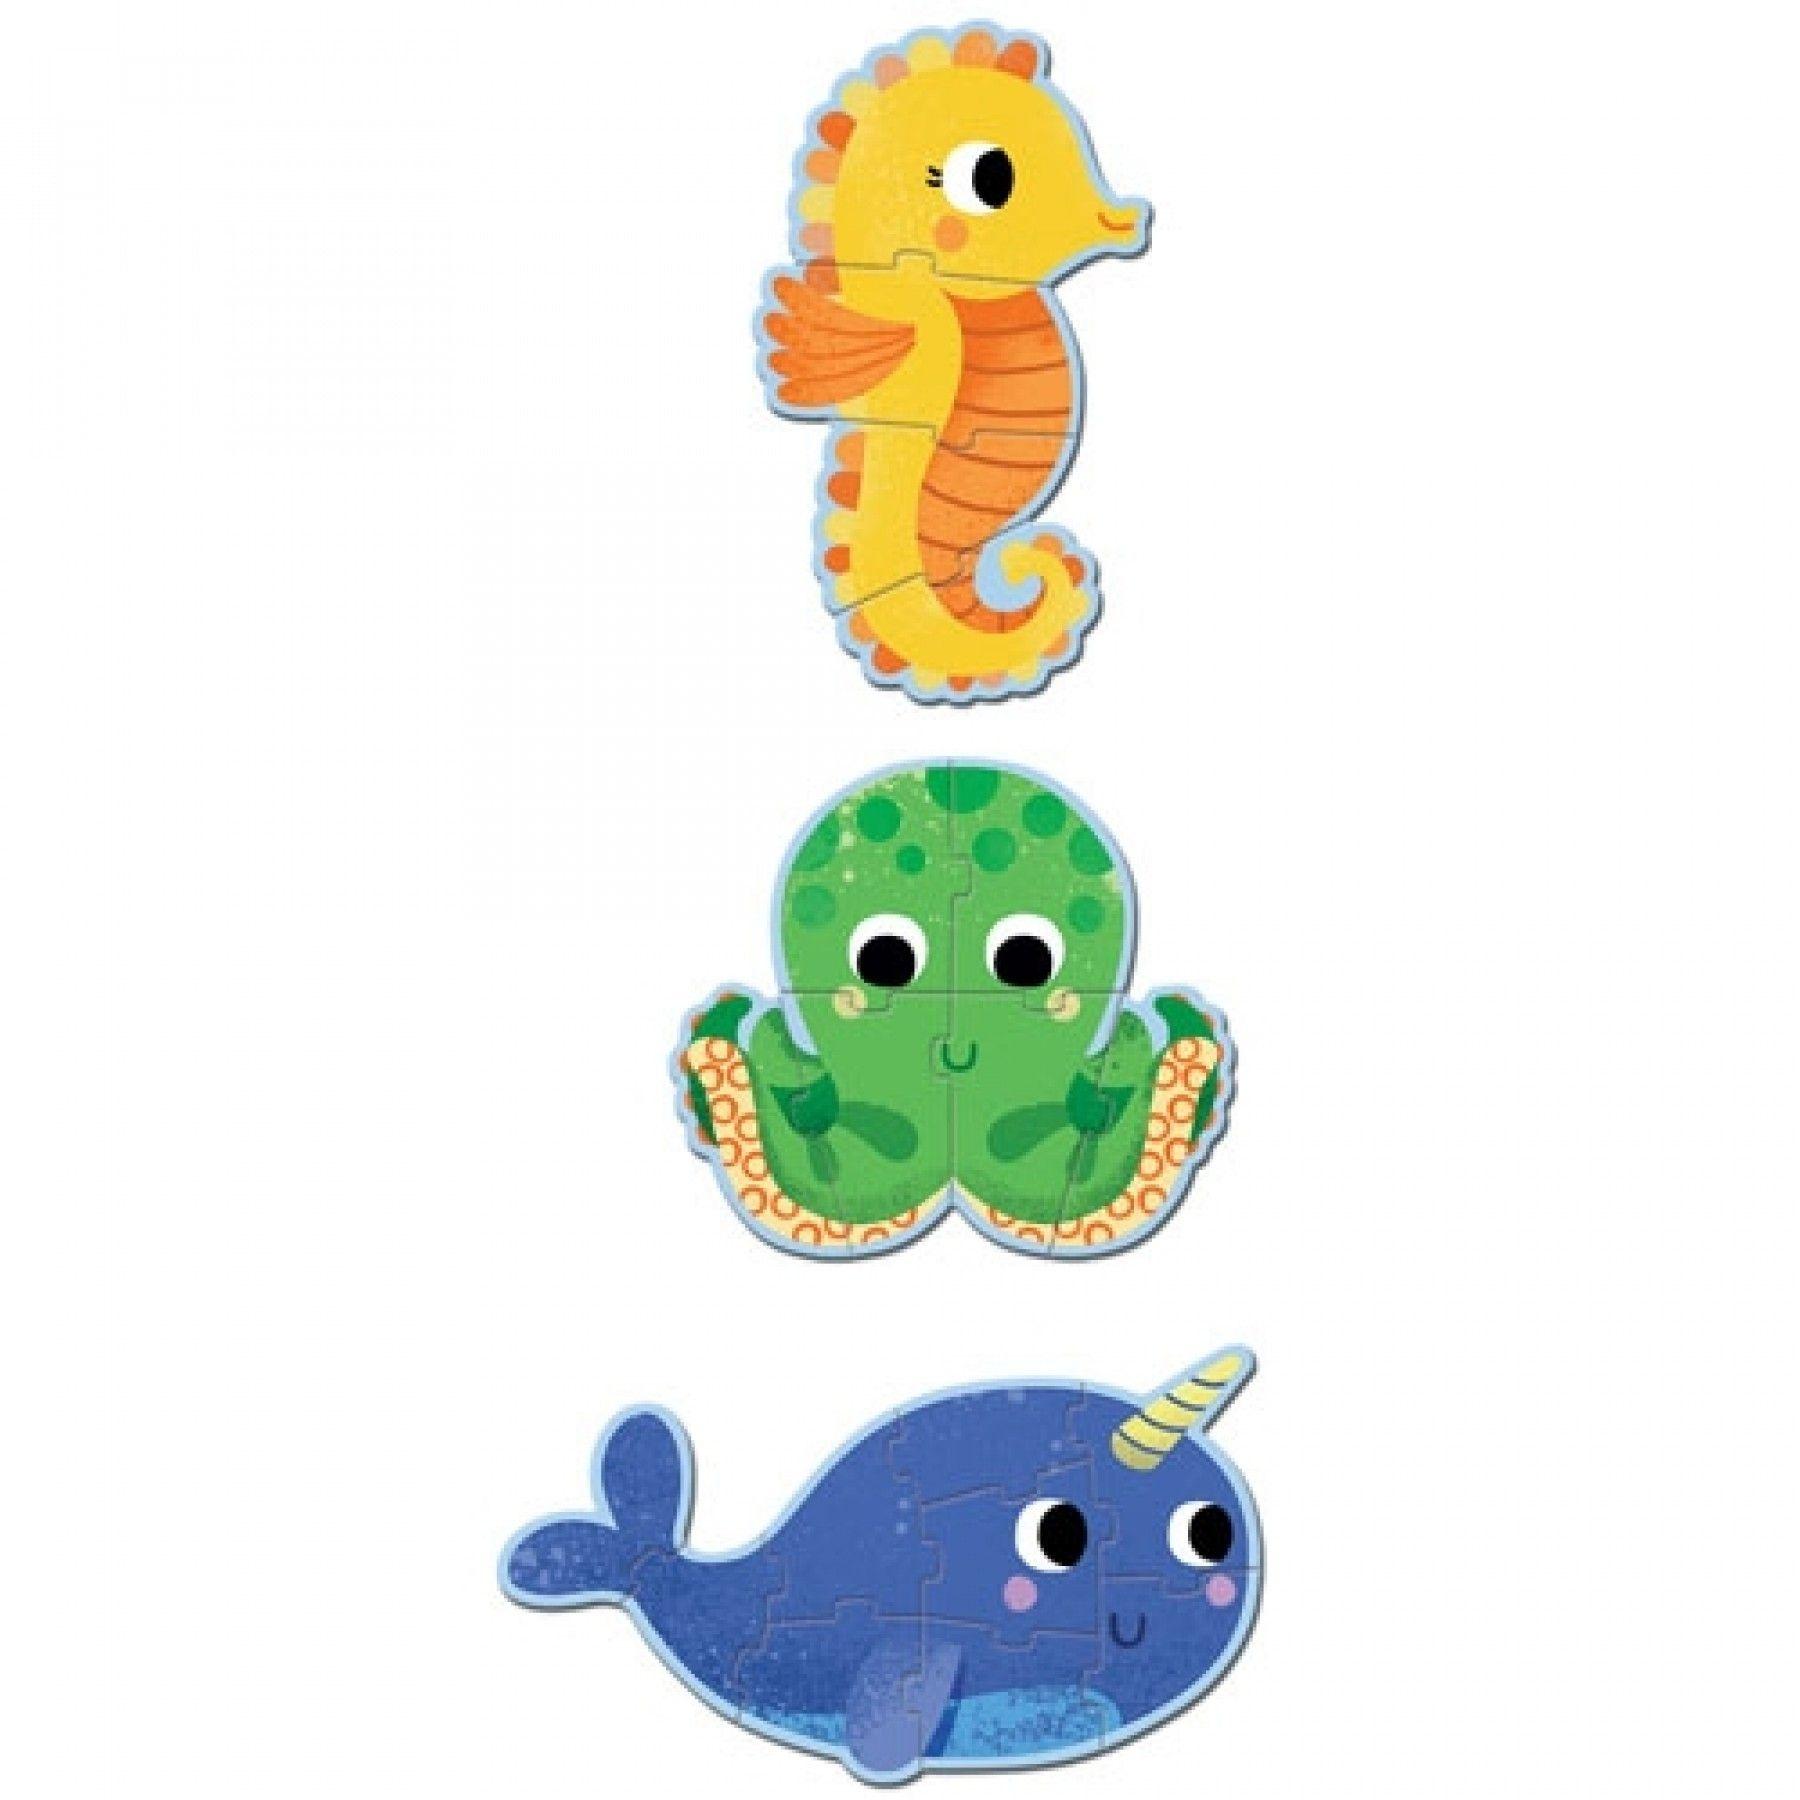 Djeco Djeco Puzzle Primo - In de zee - 3  puzzels 2y+